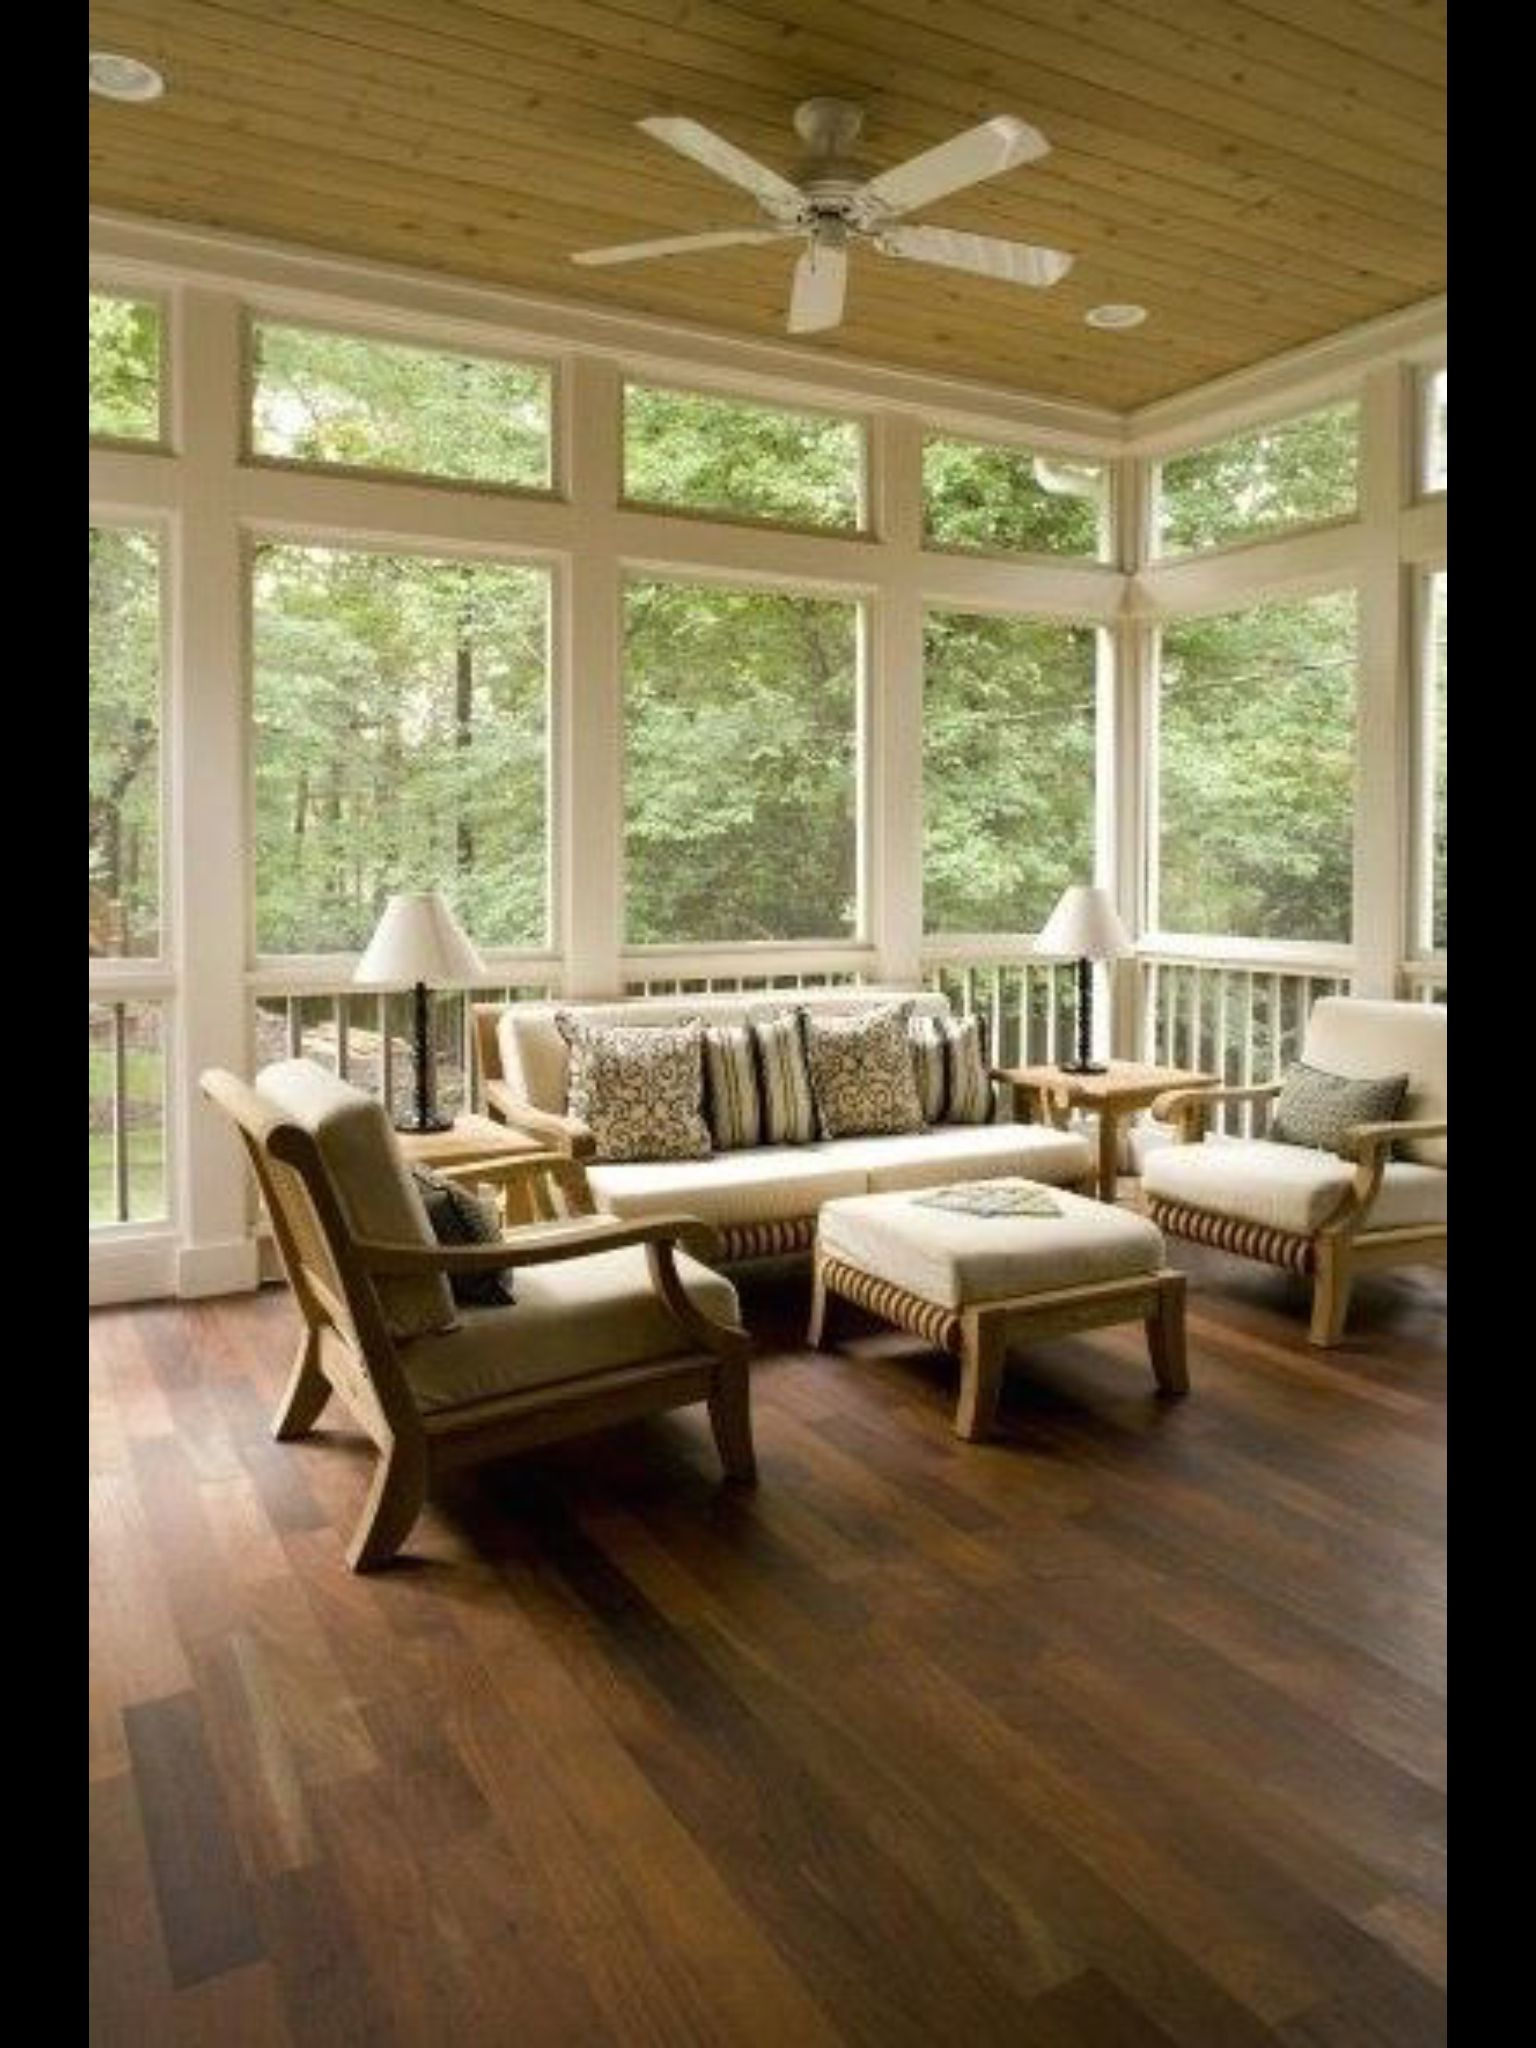 Screen Room Design Ideas: Beautiful Sun Room